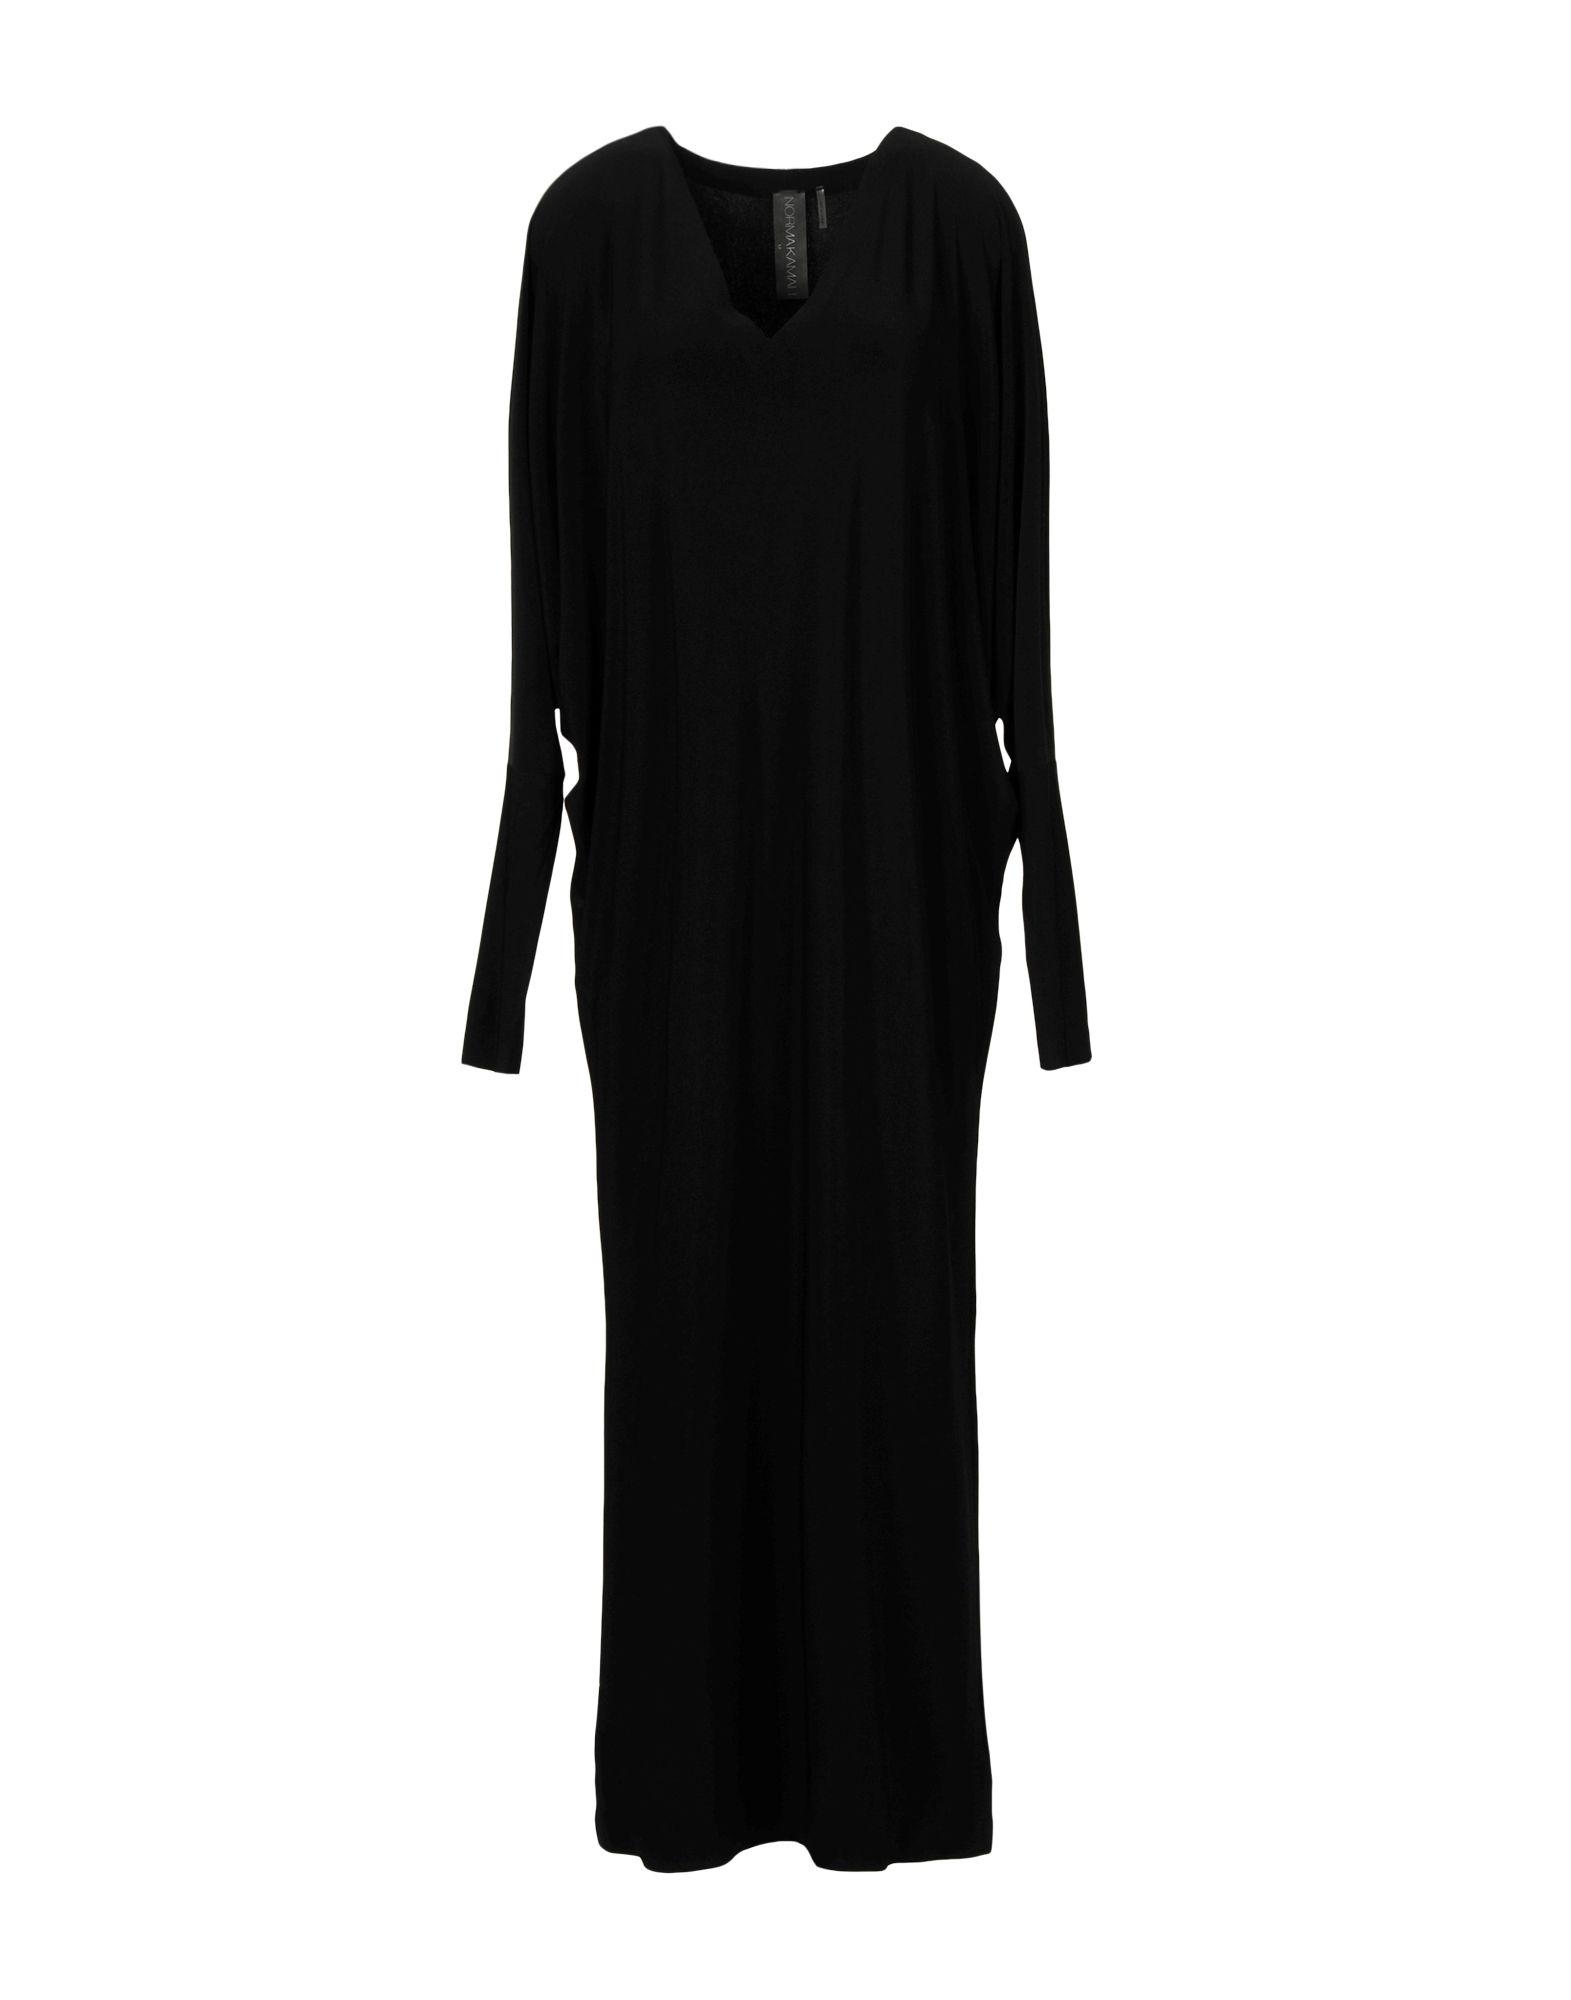 NORMA KAMALI Платье длиной 3/4 lisa corti платье длиной 3 4